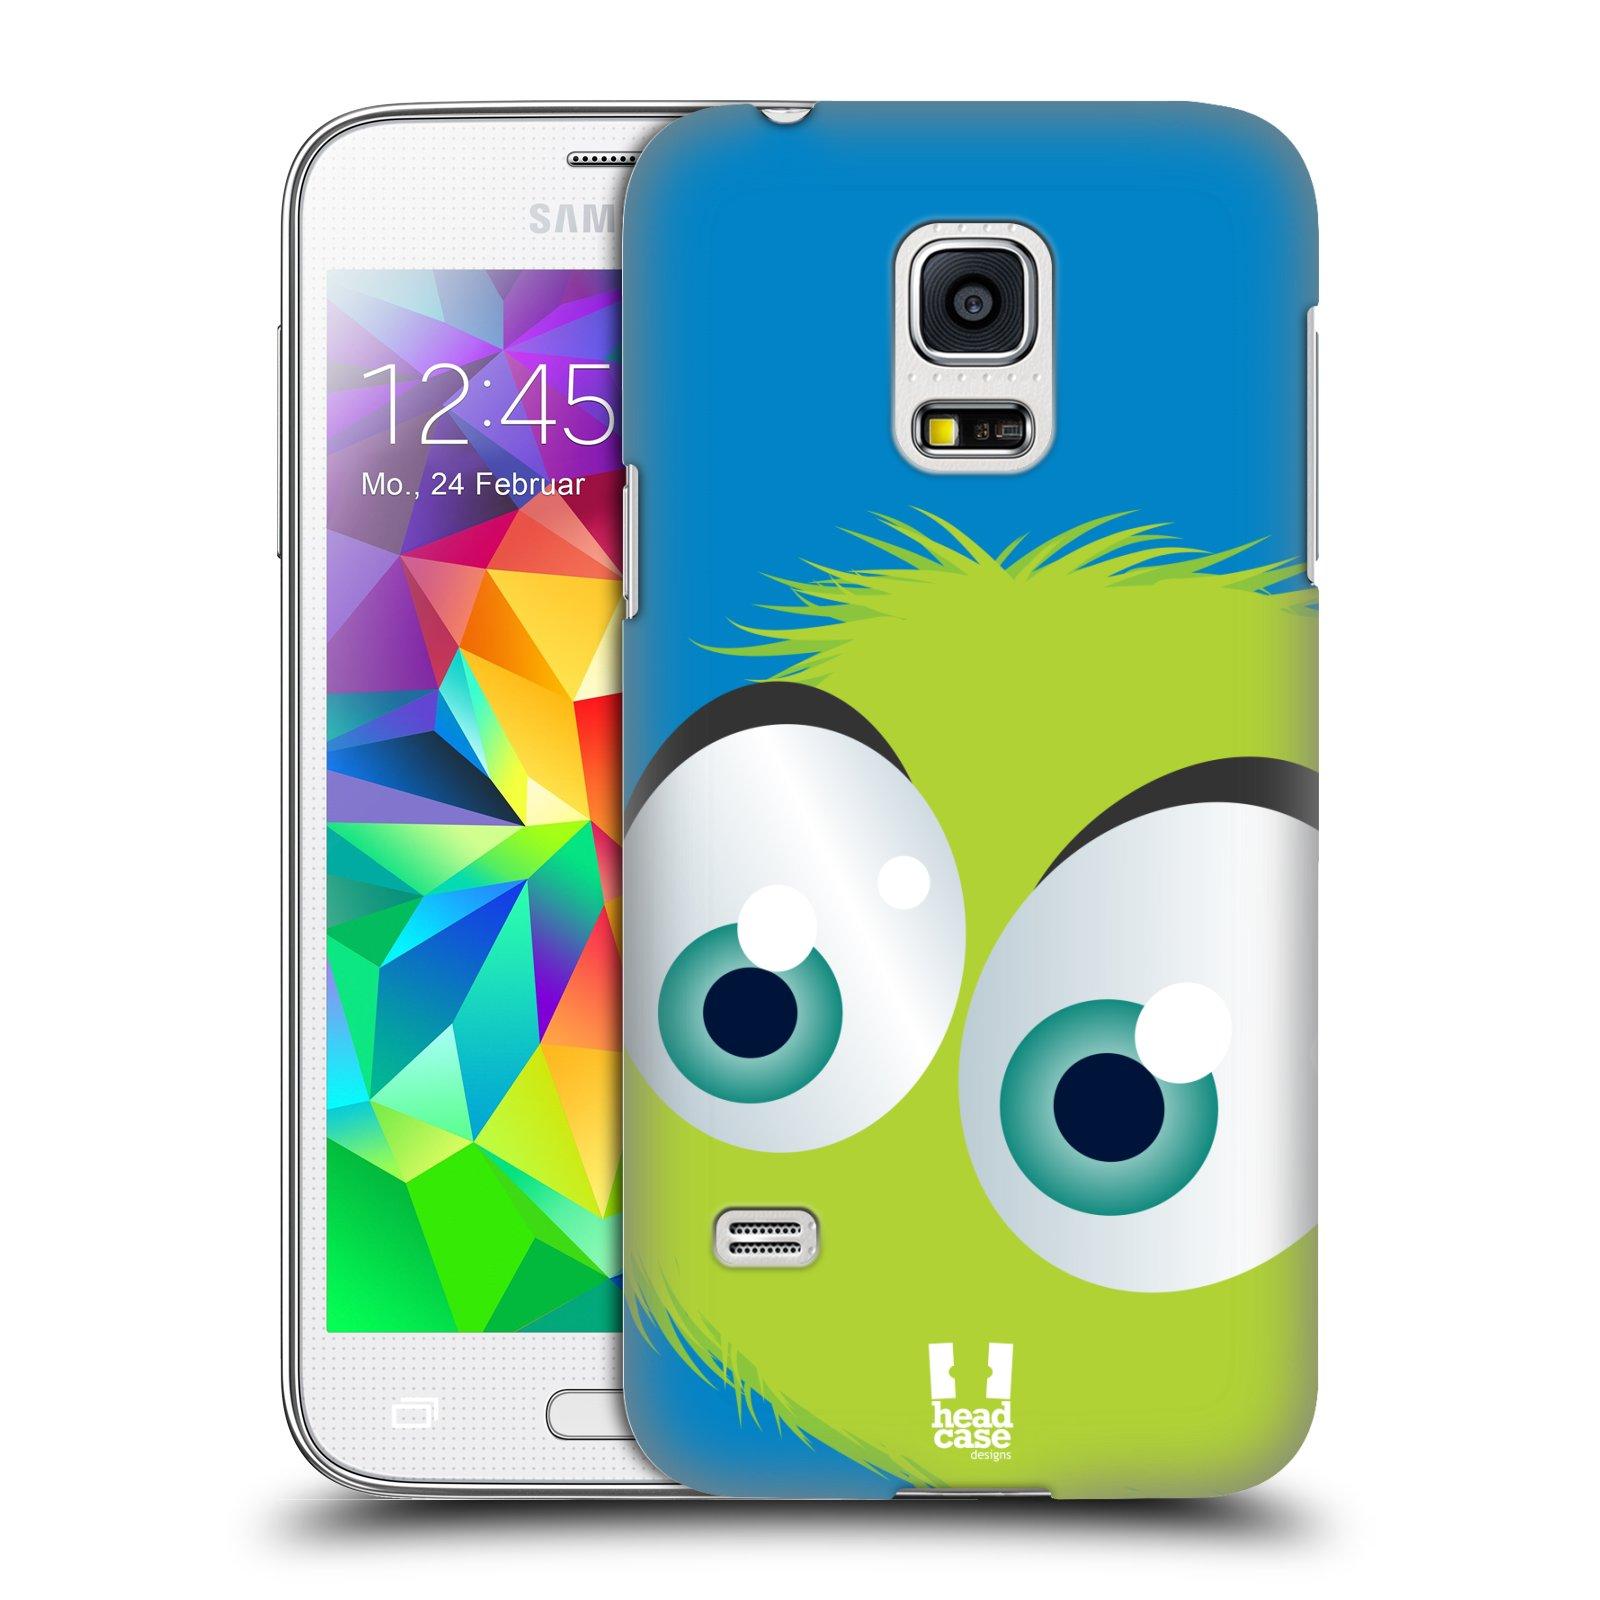 Plastové pouzdro na mobil Samsung Galaxy S5 Mini HEAD CASE FUZÍK ZELENÝ (Kryt či obal na mobilní telefon Samsung Galaxy S5 Mini SM-G800F)